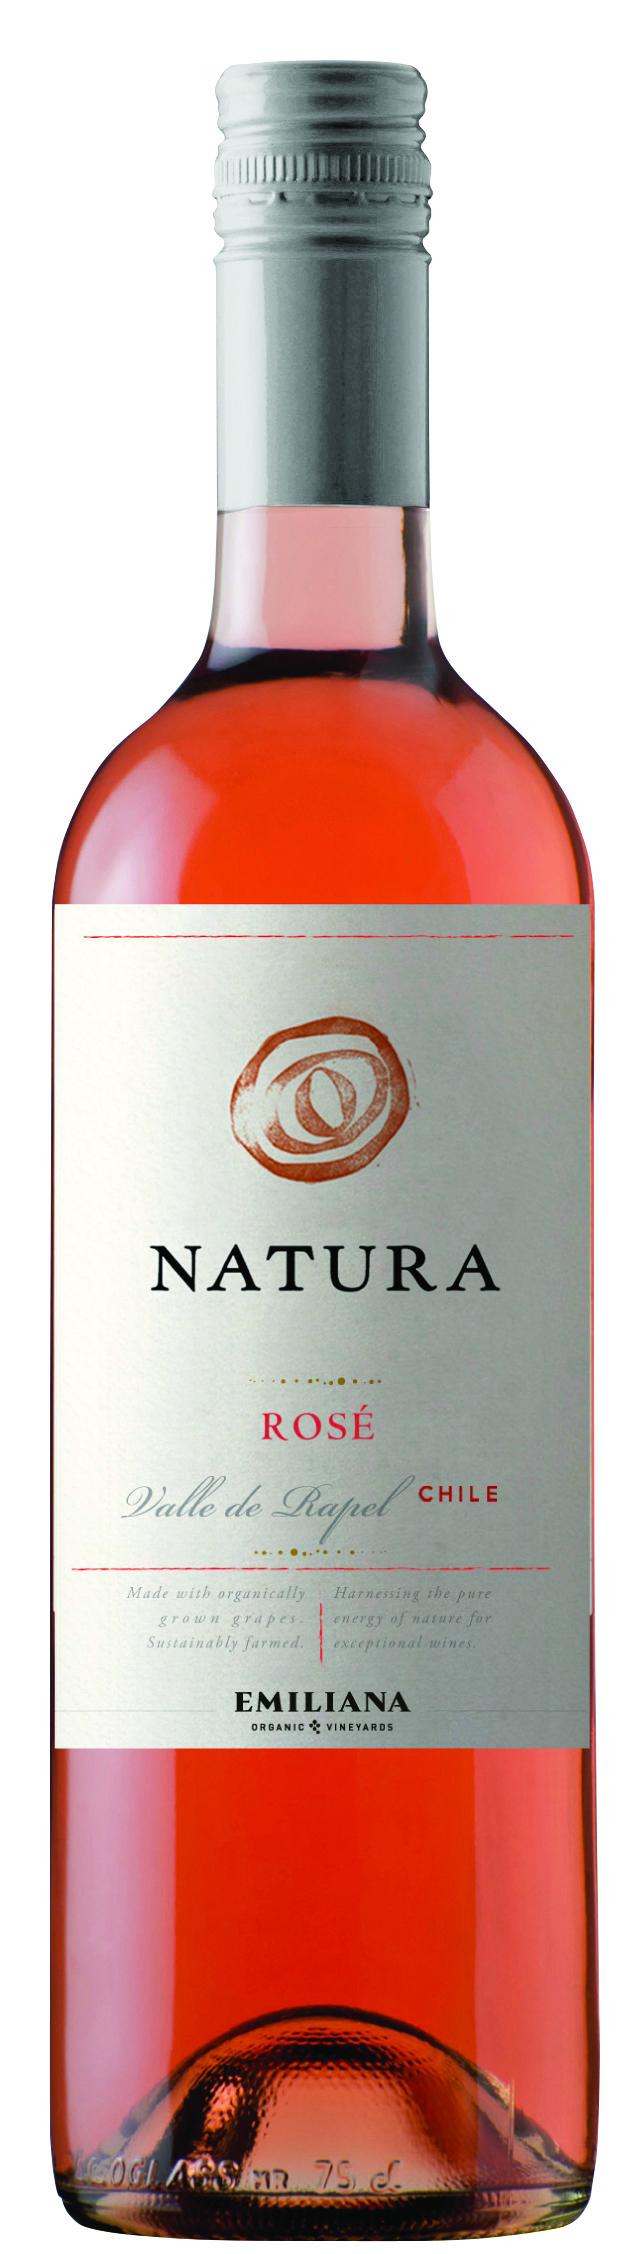 natura rose 2014 (002).jpg